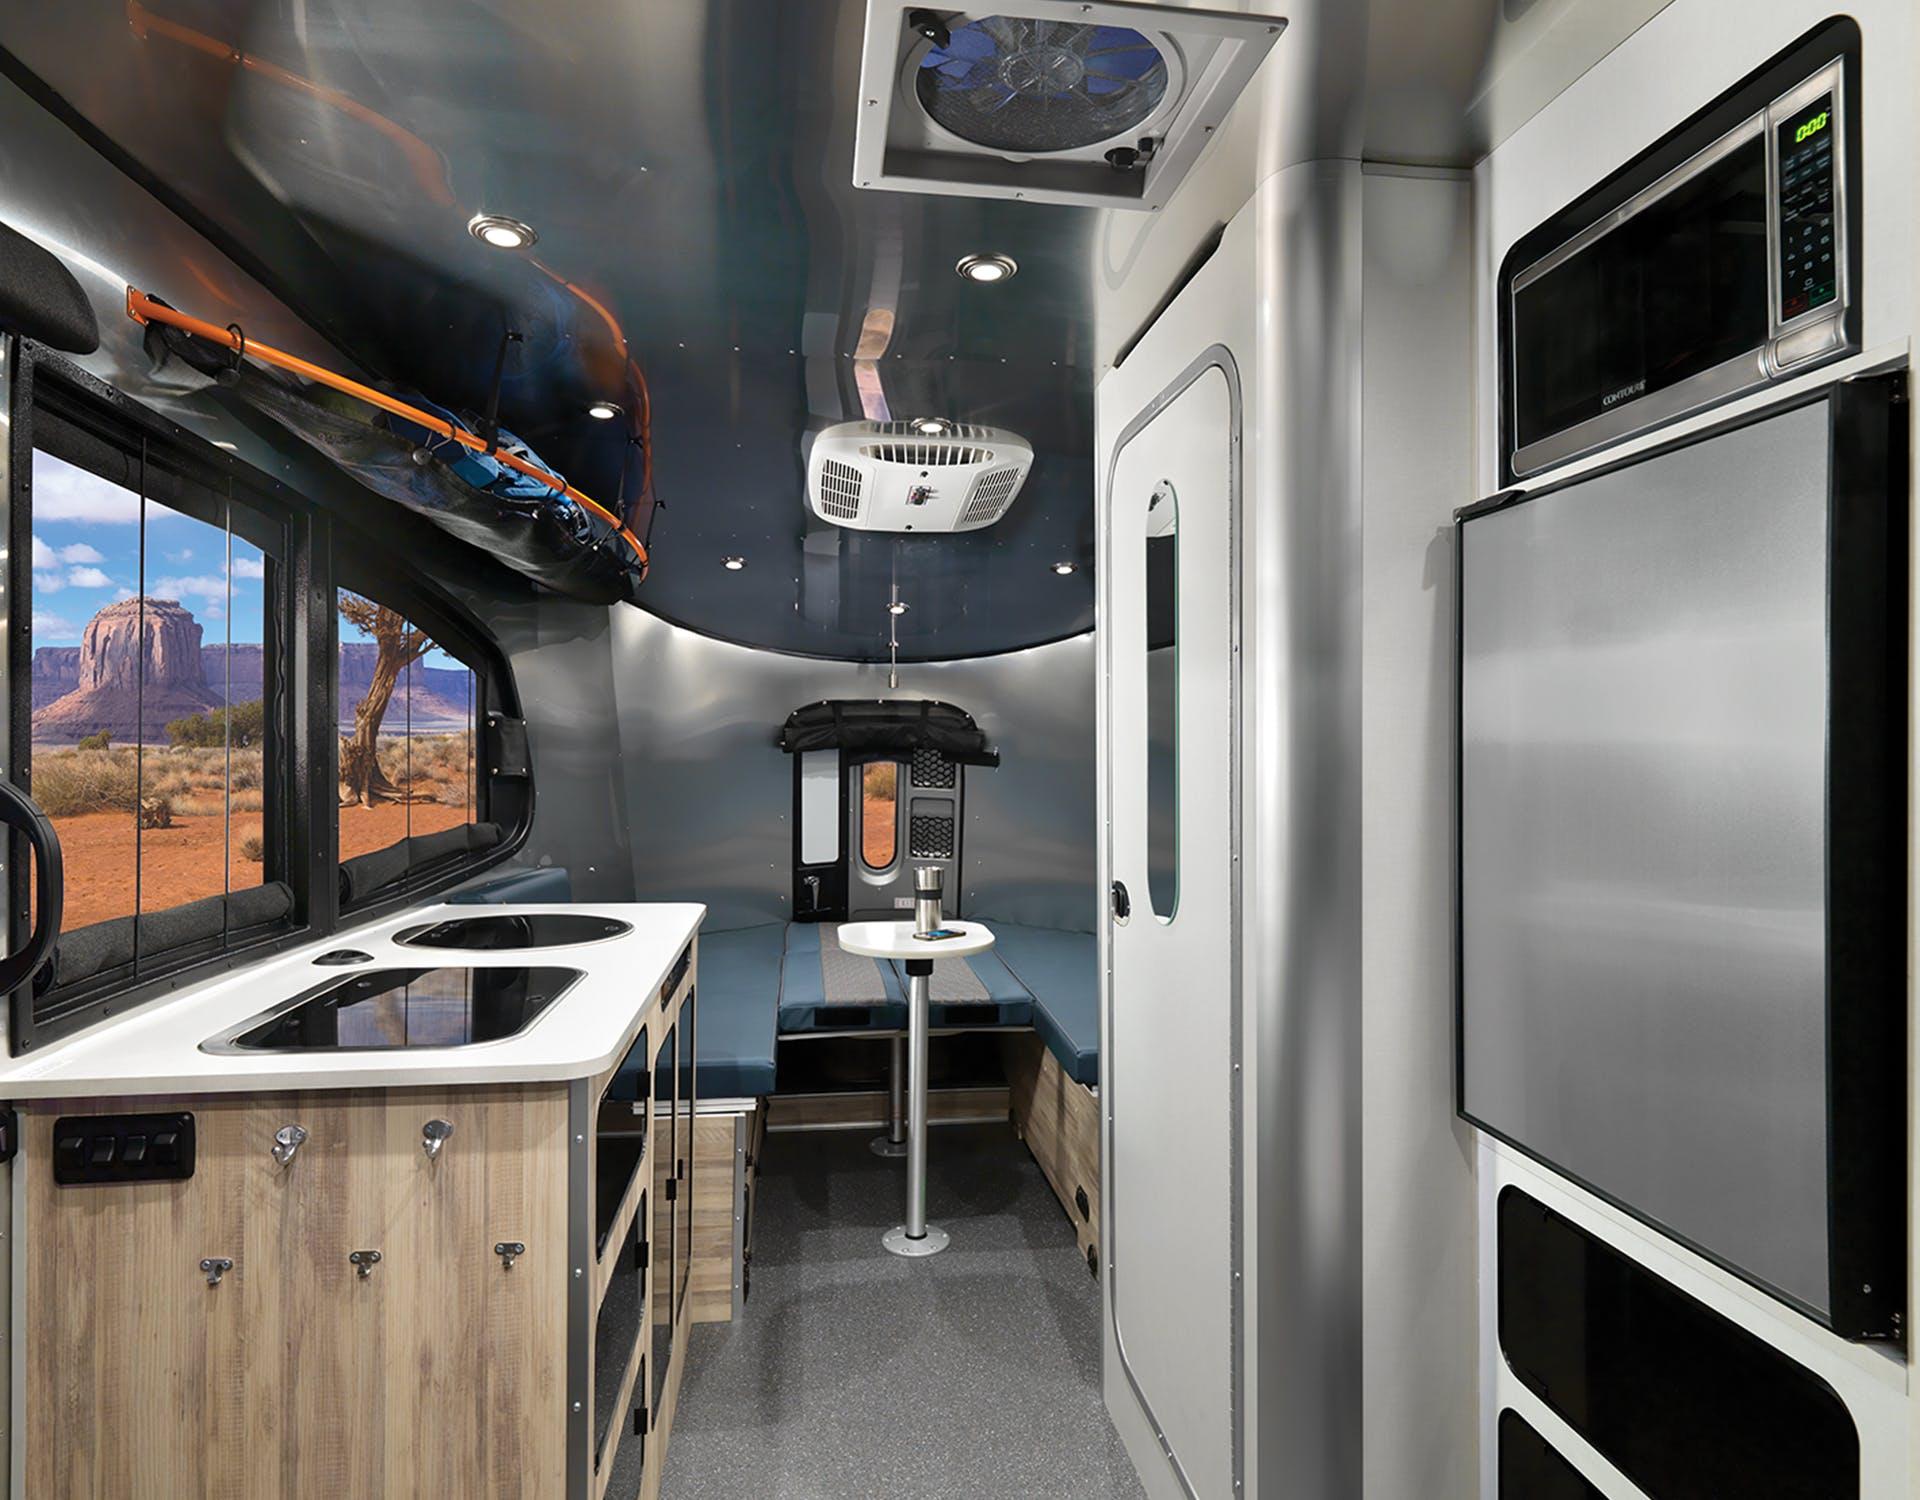 Airstream-Basecamp-20-Glacier-Lake-Interior-F2B-One-Table-U-Seating